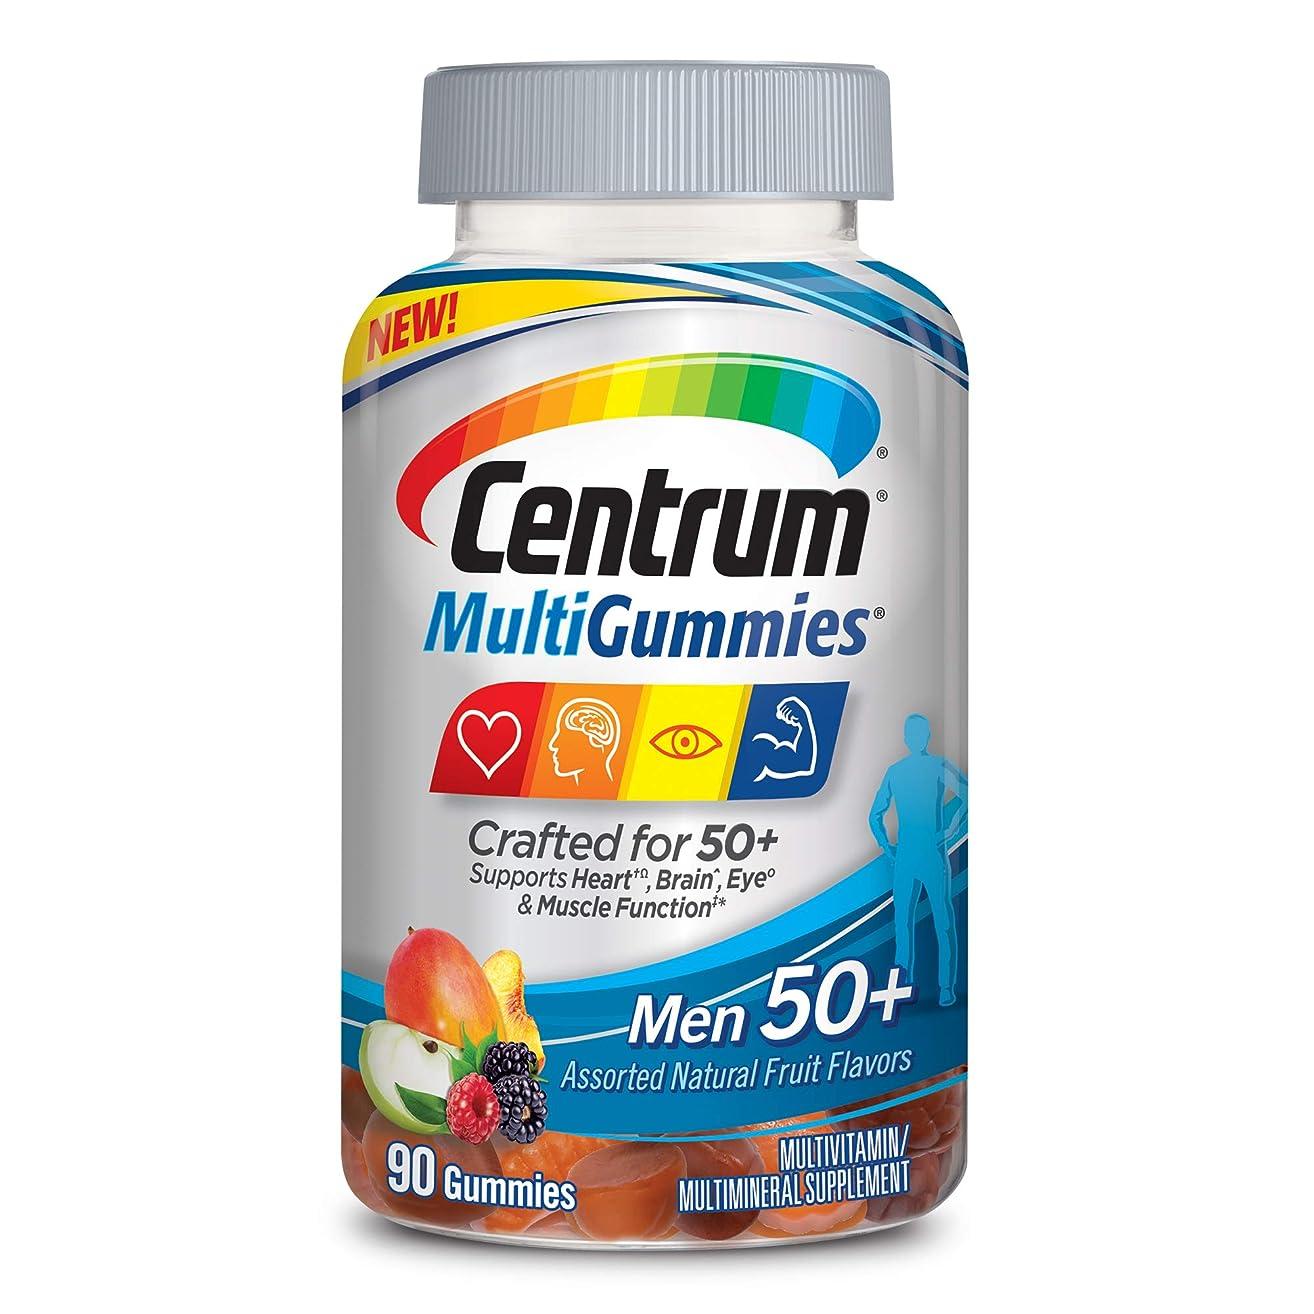 New Centrum MultiGummies Men 50+ (90Count) Multivitamin/Multimineral Supplement Gummies, with 100% DV of Vitamins D3, E, B6, B12, Age 50+